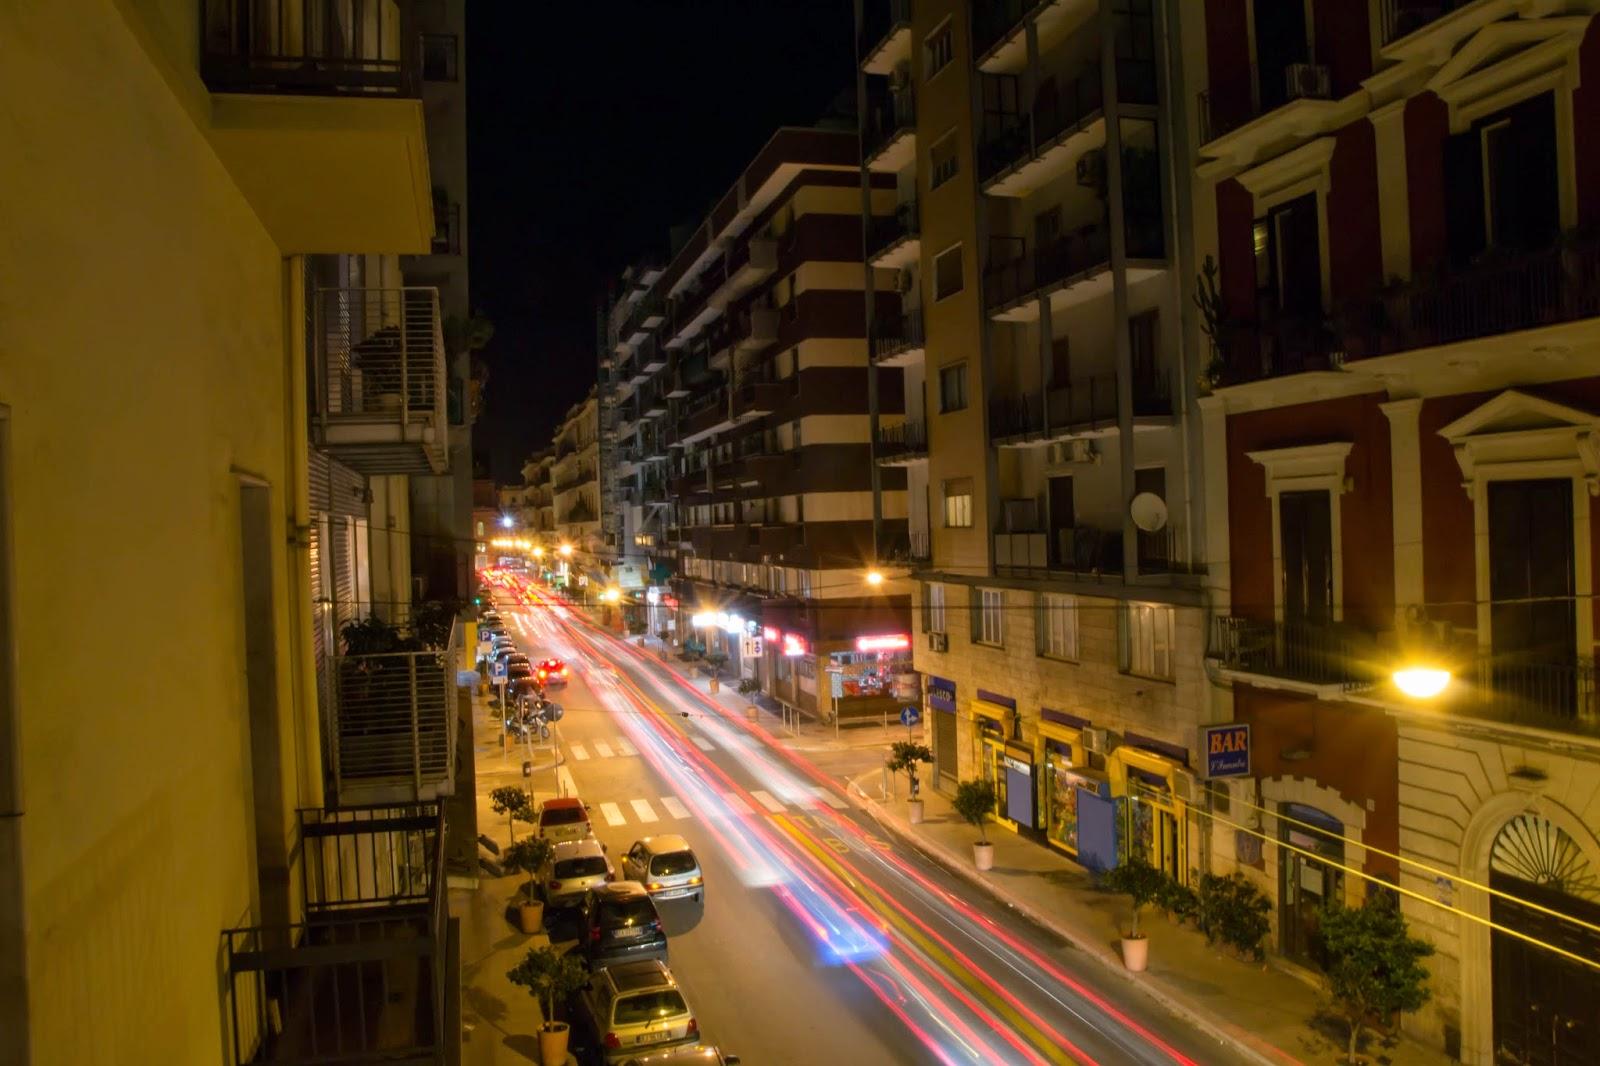 bari-city-italia